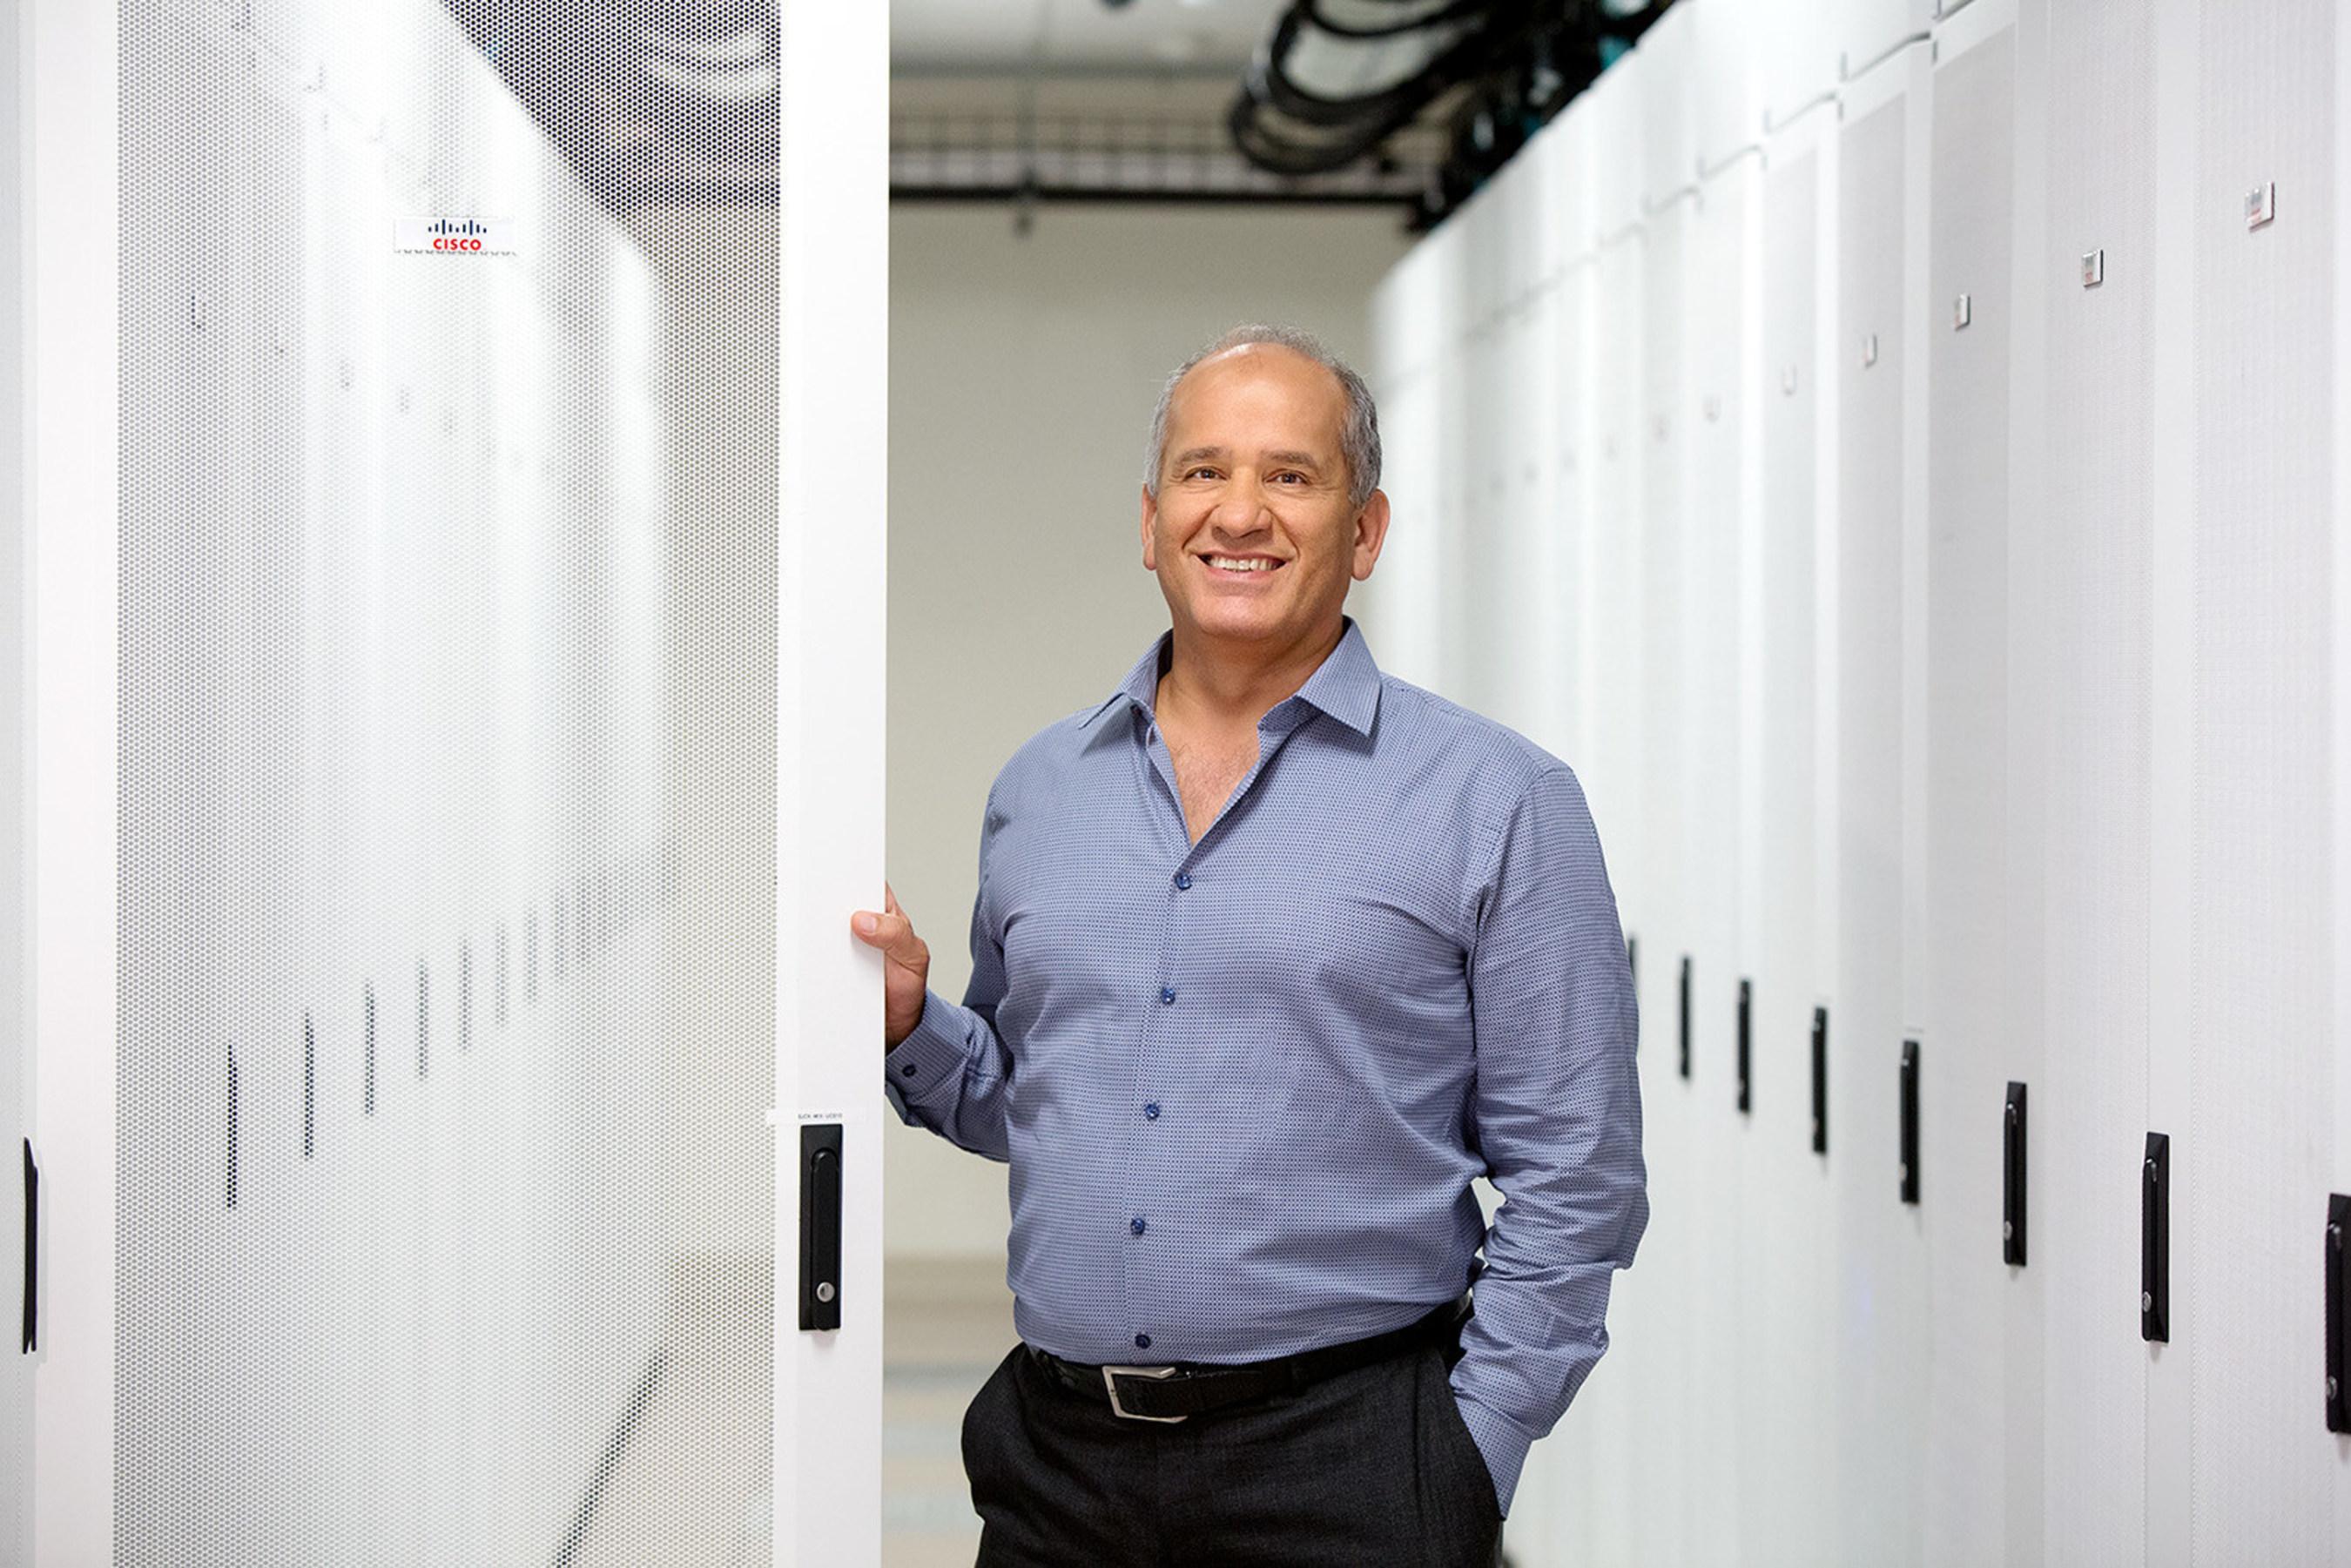 Aquantia' Raises $37 Million in Growth Capital Targeting the Billion Ethernet Port Opportunity in Data Center & Enterprise